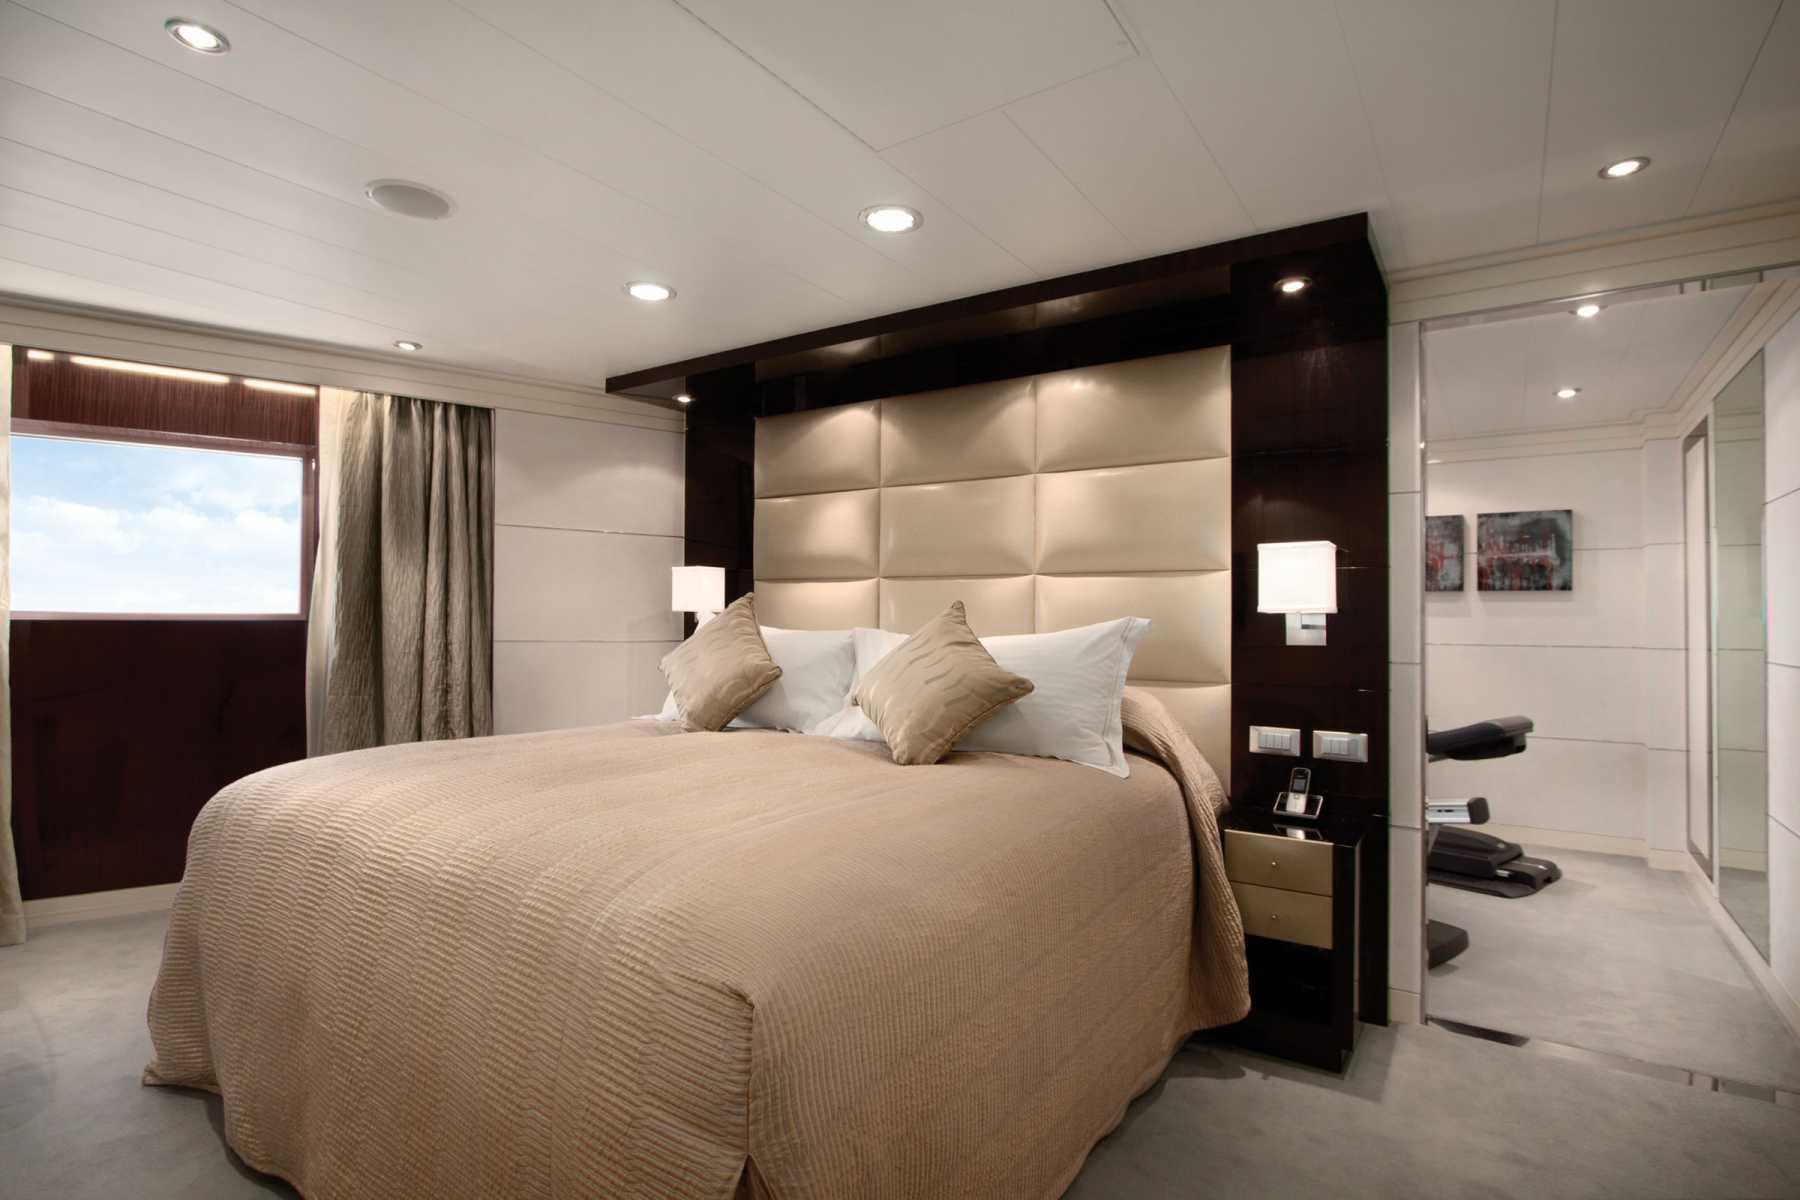 Oceania Cruises Oceania Class Accommodation Vista Suite Bedroom.jpg